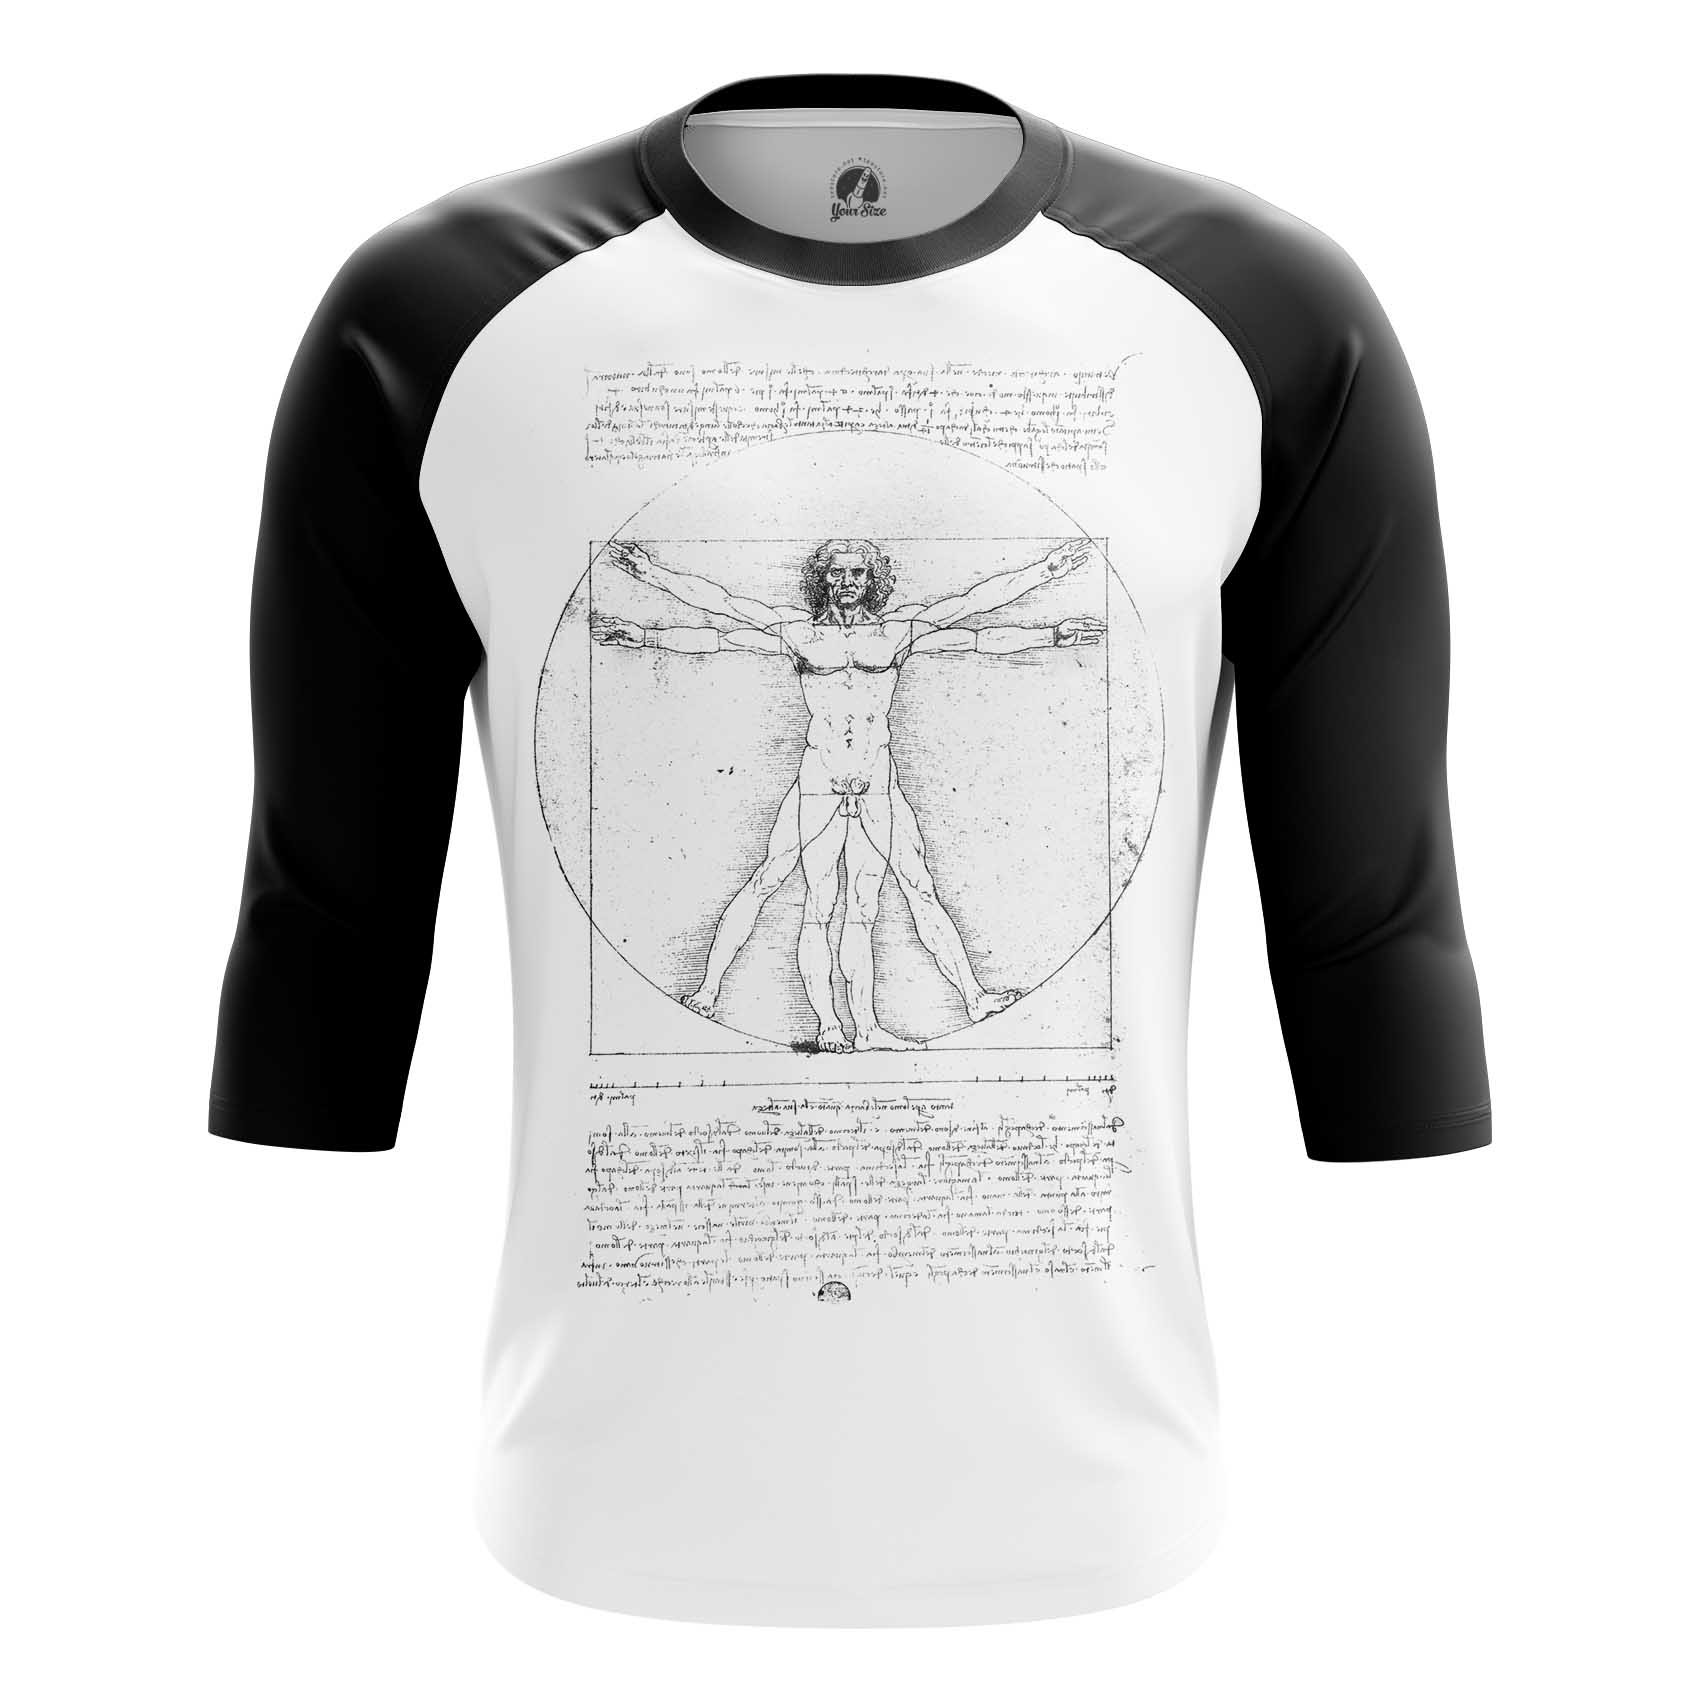 aada1bb8d Raglan t-shirt Vitruvian Man Leonardo da Vinci Fine - IdolStore